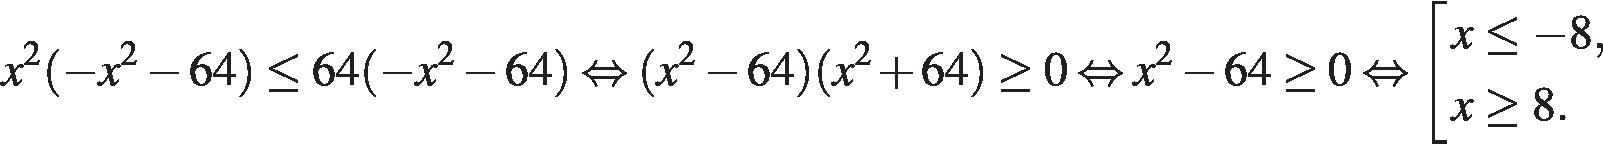 http://sdamgia.ru/formula/84/84df0aa41a9b363e3c255d359d173951p.png